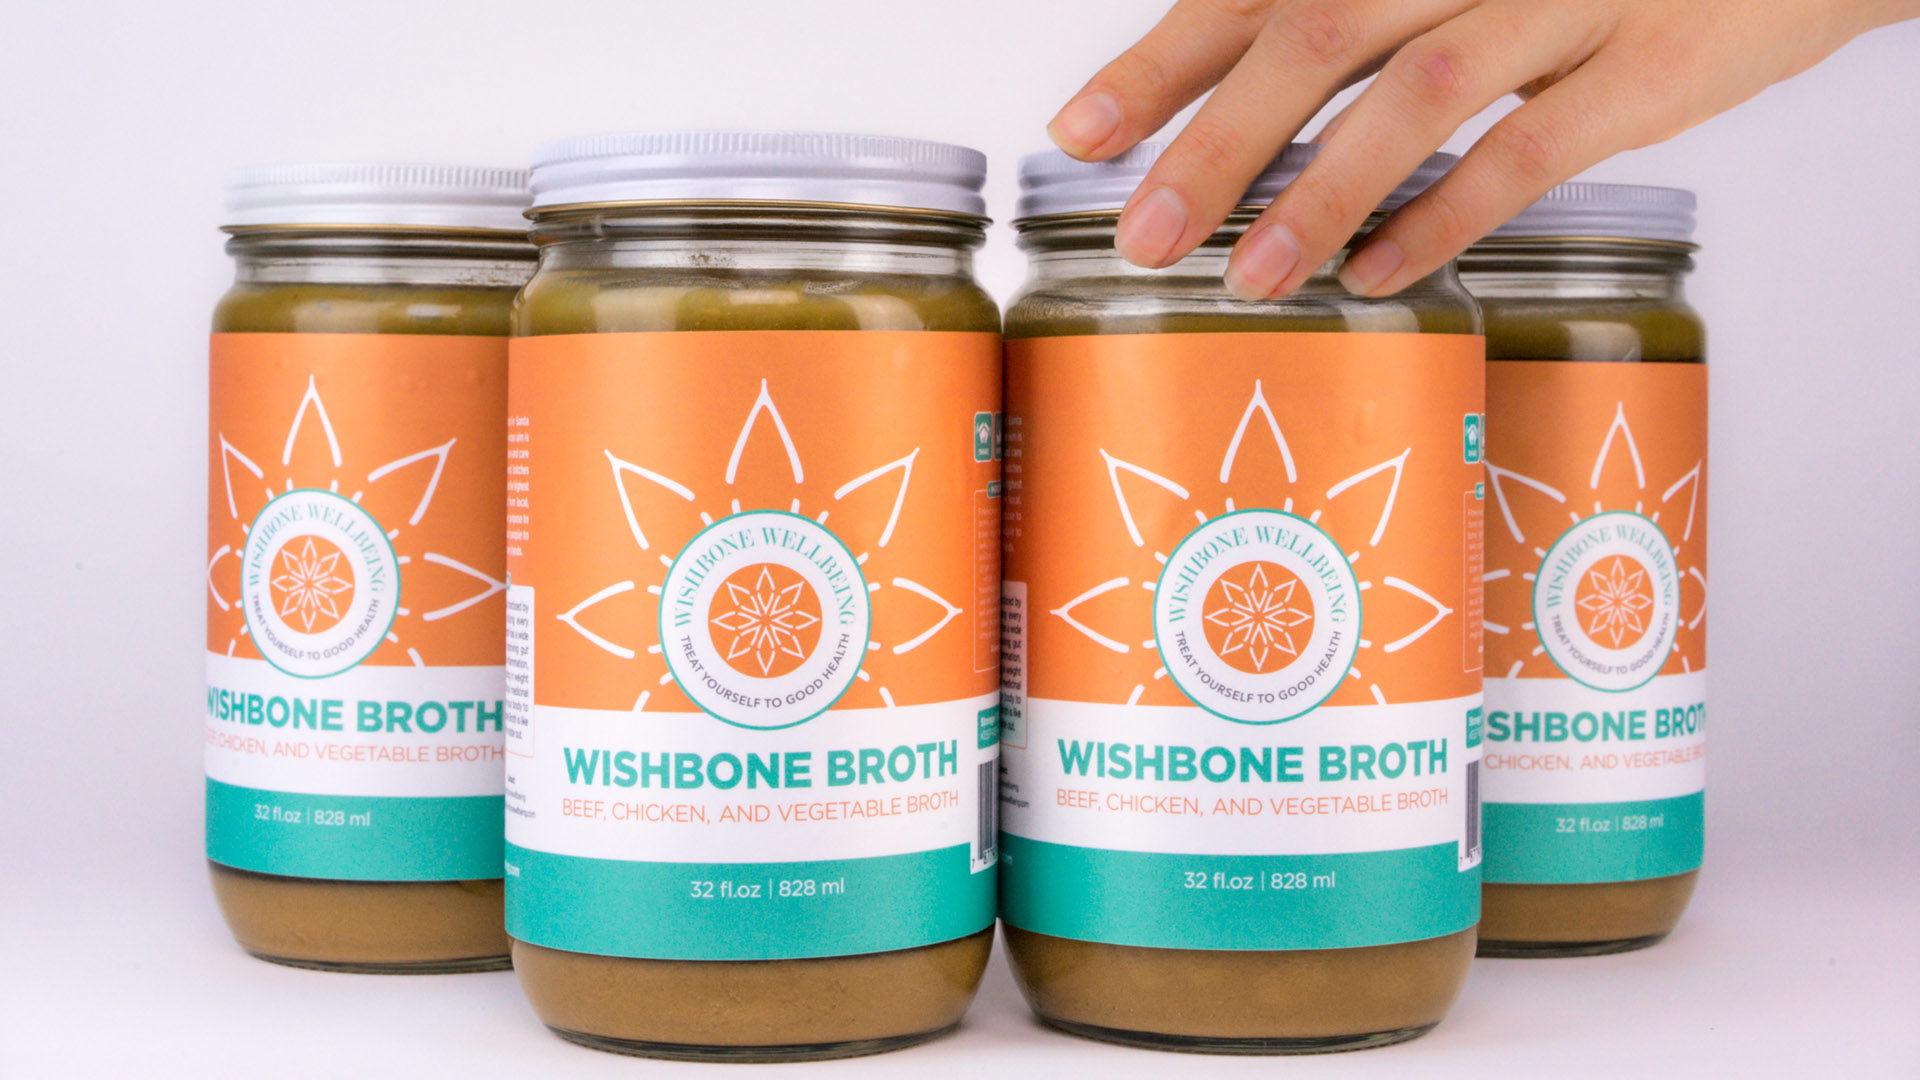 Buy Wishbone Wellbeing Bone Broth in Santa Barbara, CA